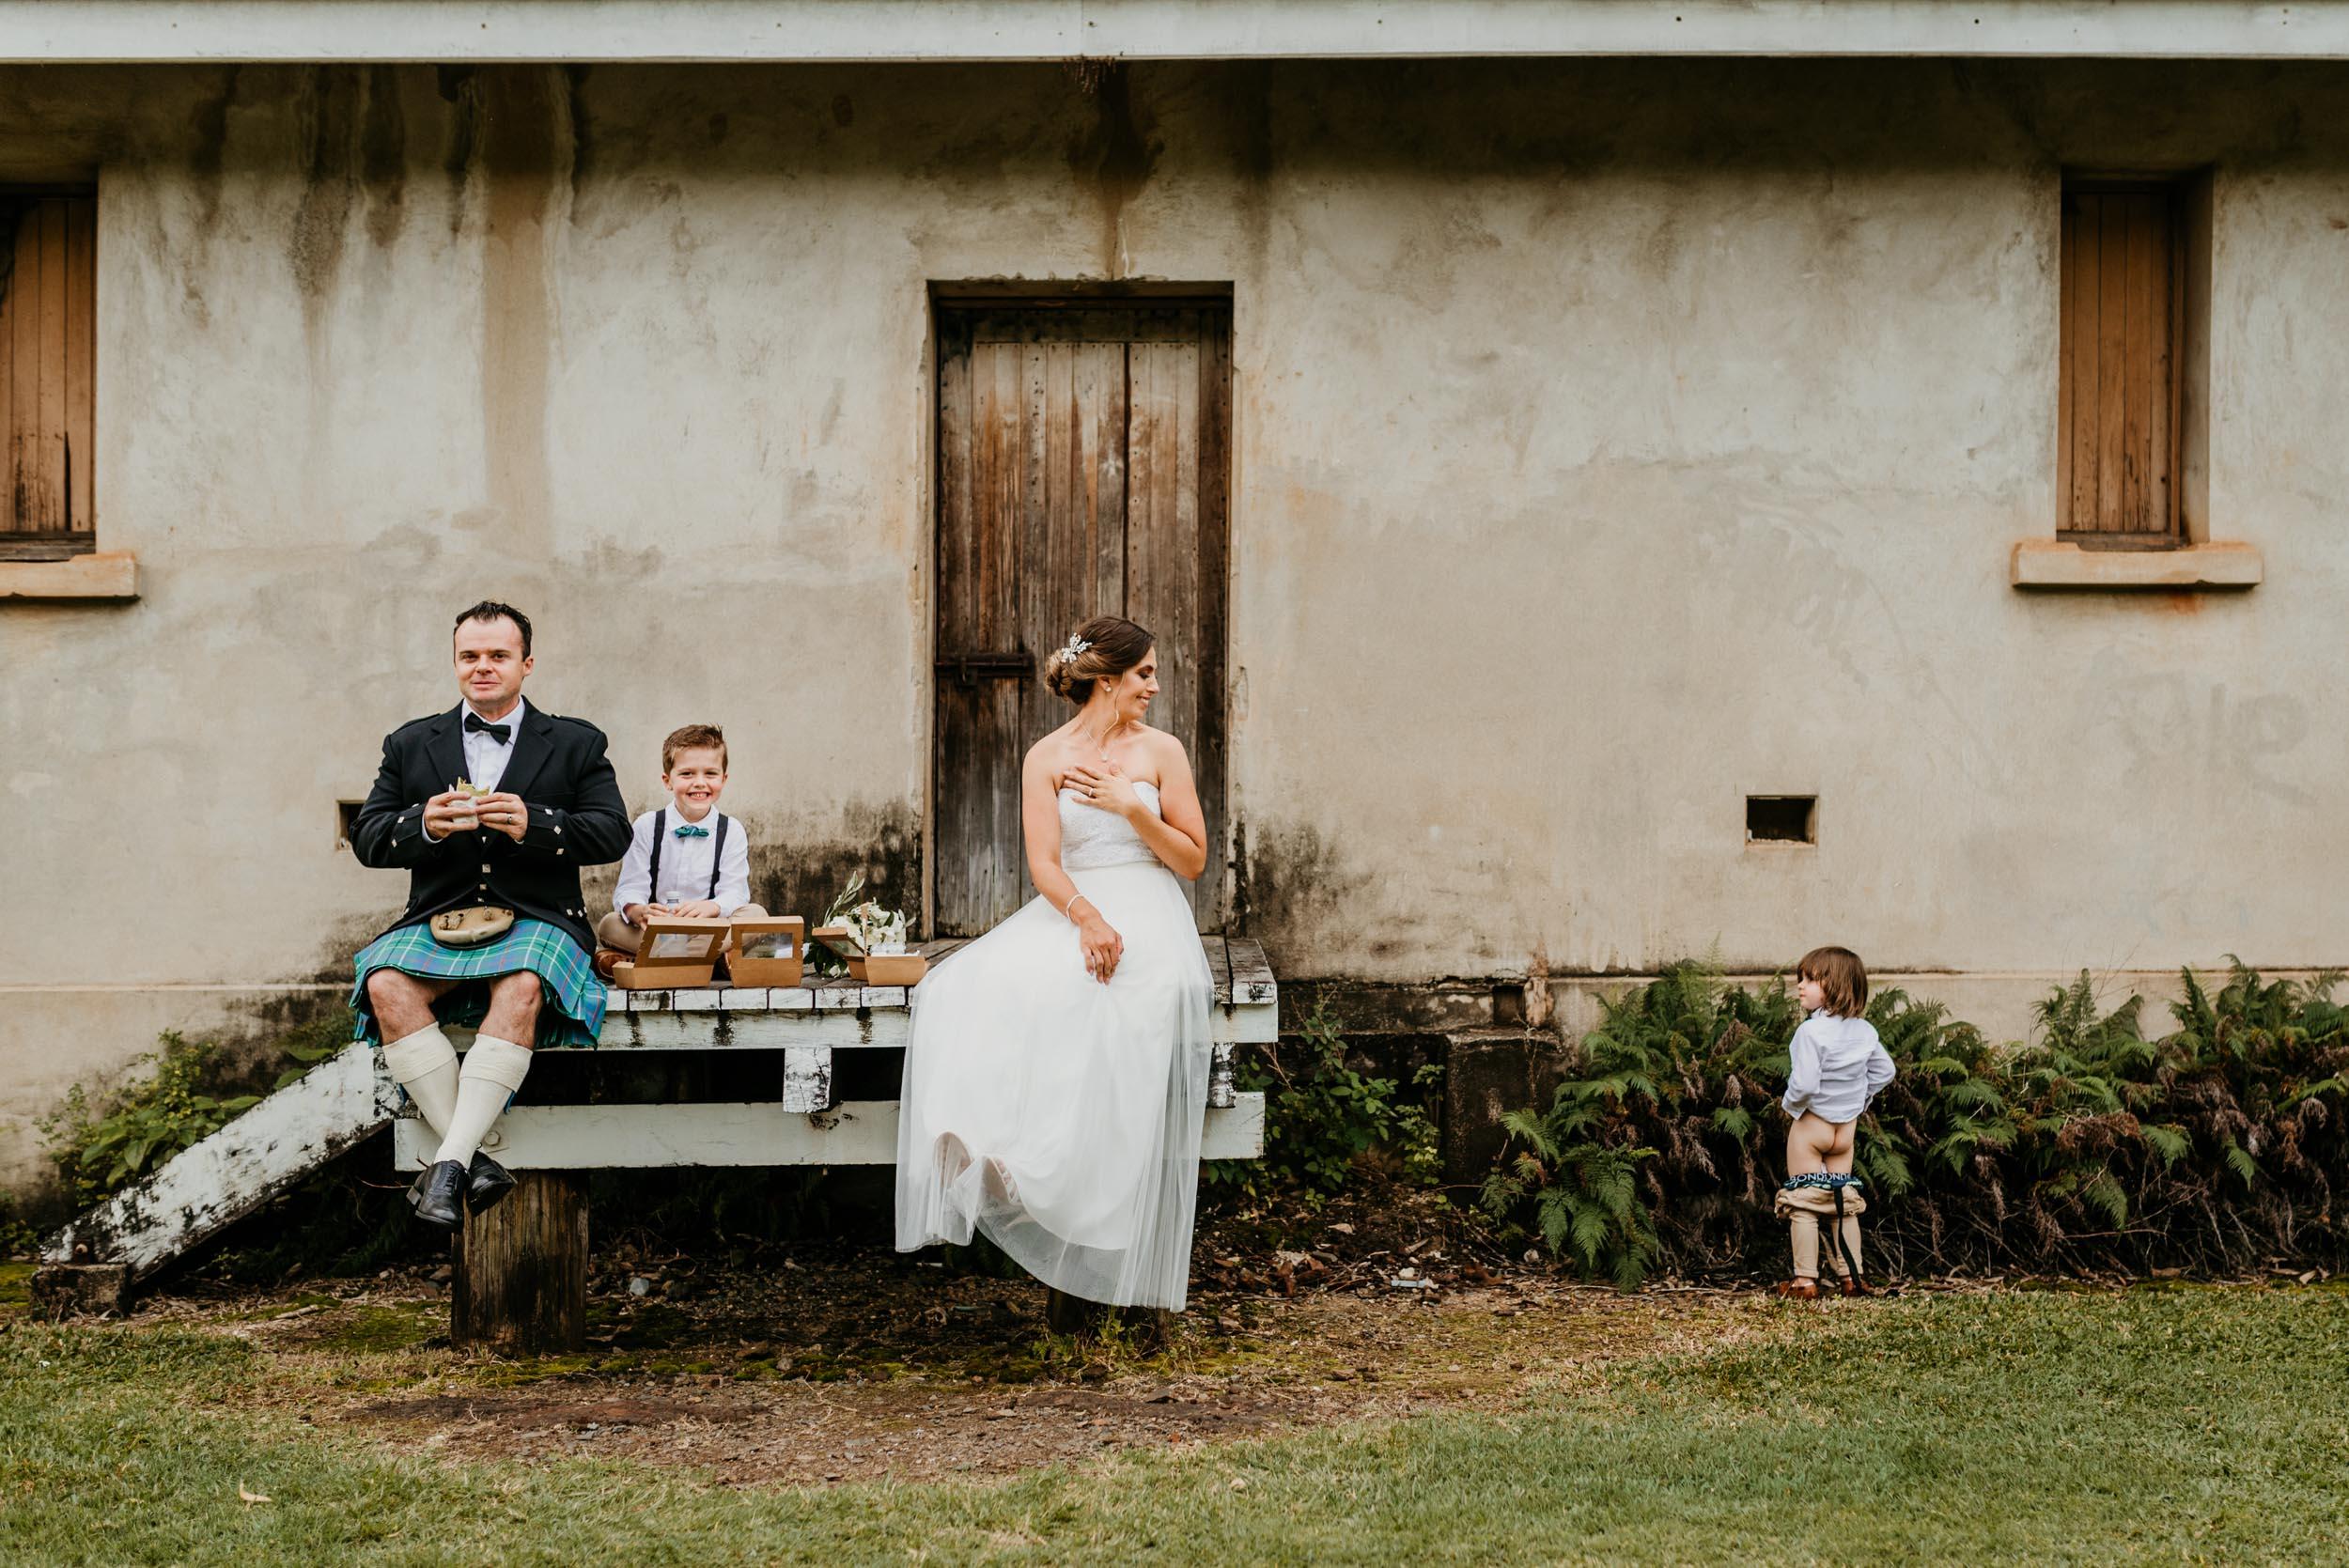 The Raw Photographer - Cairns and Port Douglas Wedding Photographer - Best of 2018-51.jpg